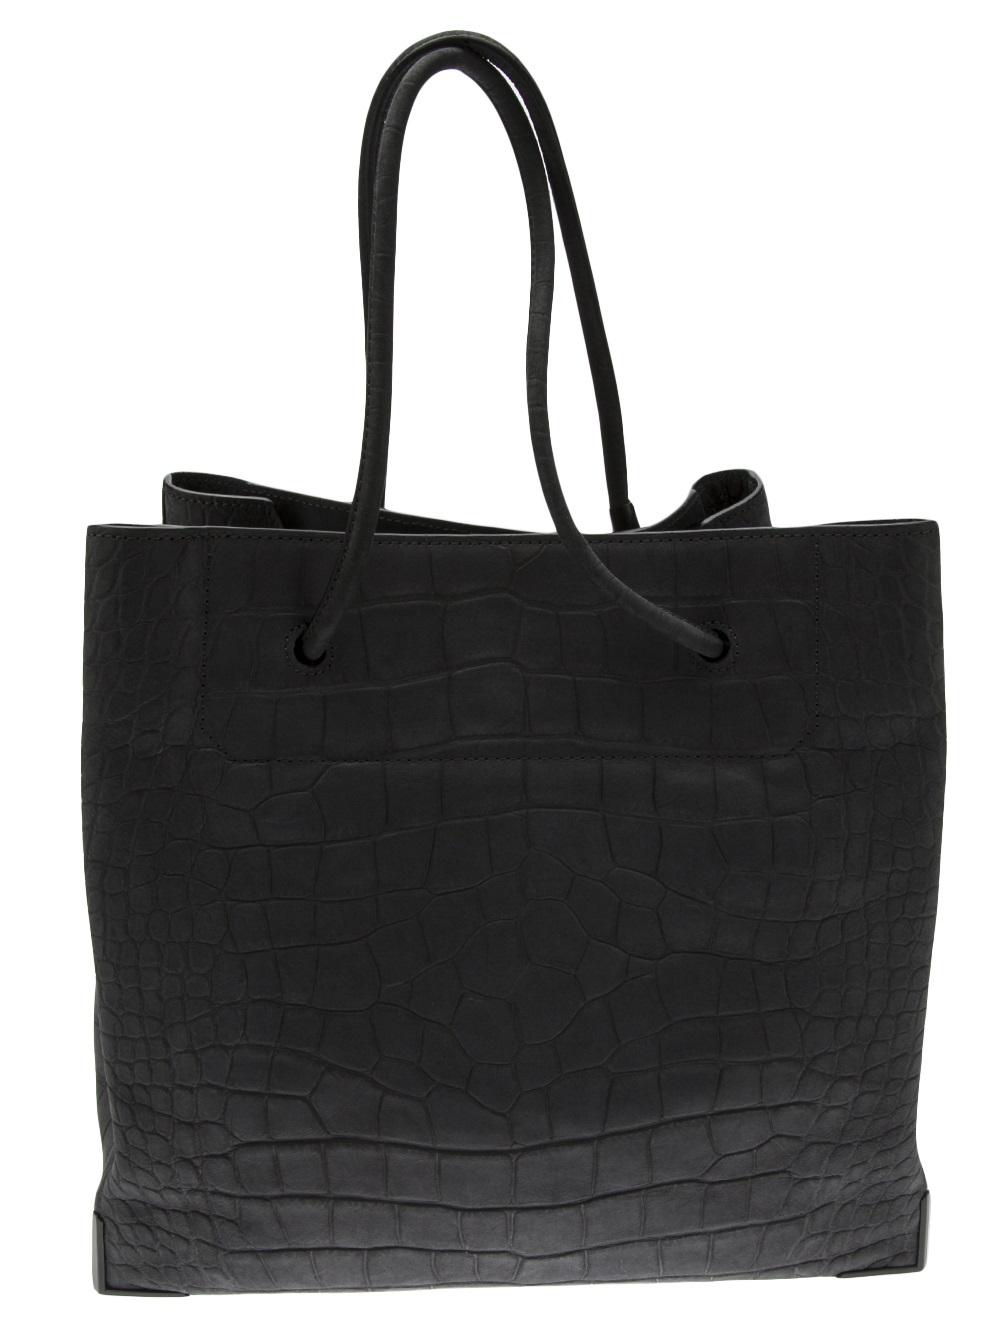 Alexander Wang Prisma Skeletal Tote Bag in Black (Grey)